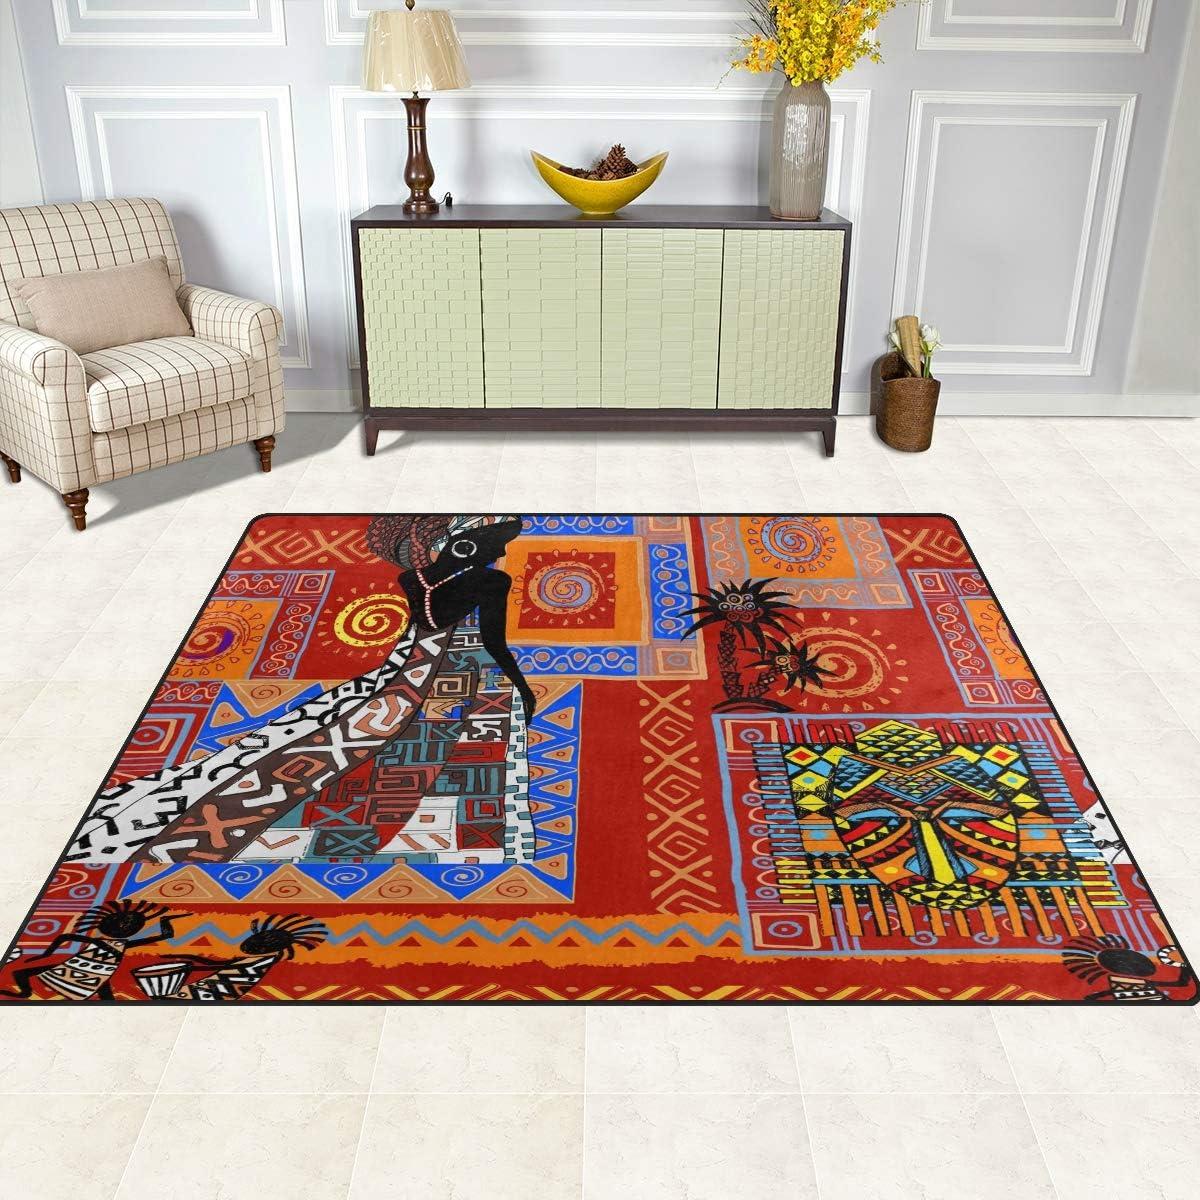 Tribal African Nursery Rug Floor Carpet Yoga Mat Naanle Traditional Africa Non Slip Area Rug for Living Dinning Room Bedroom Kitchen 50 x 80 cm 1.7 x 2.6 ft